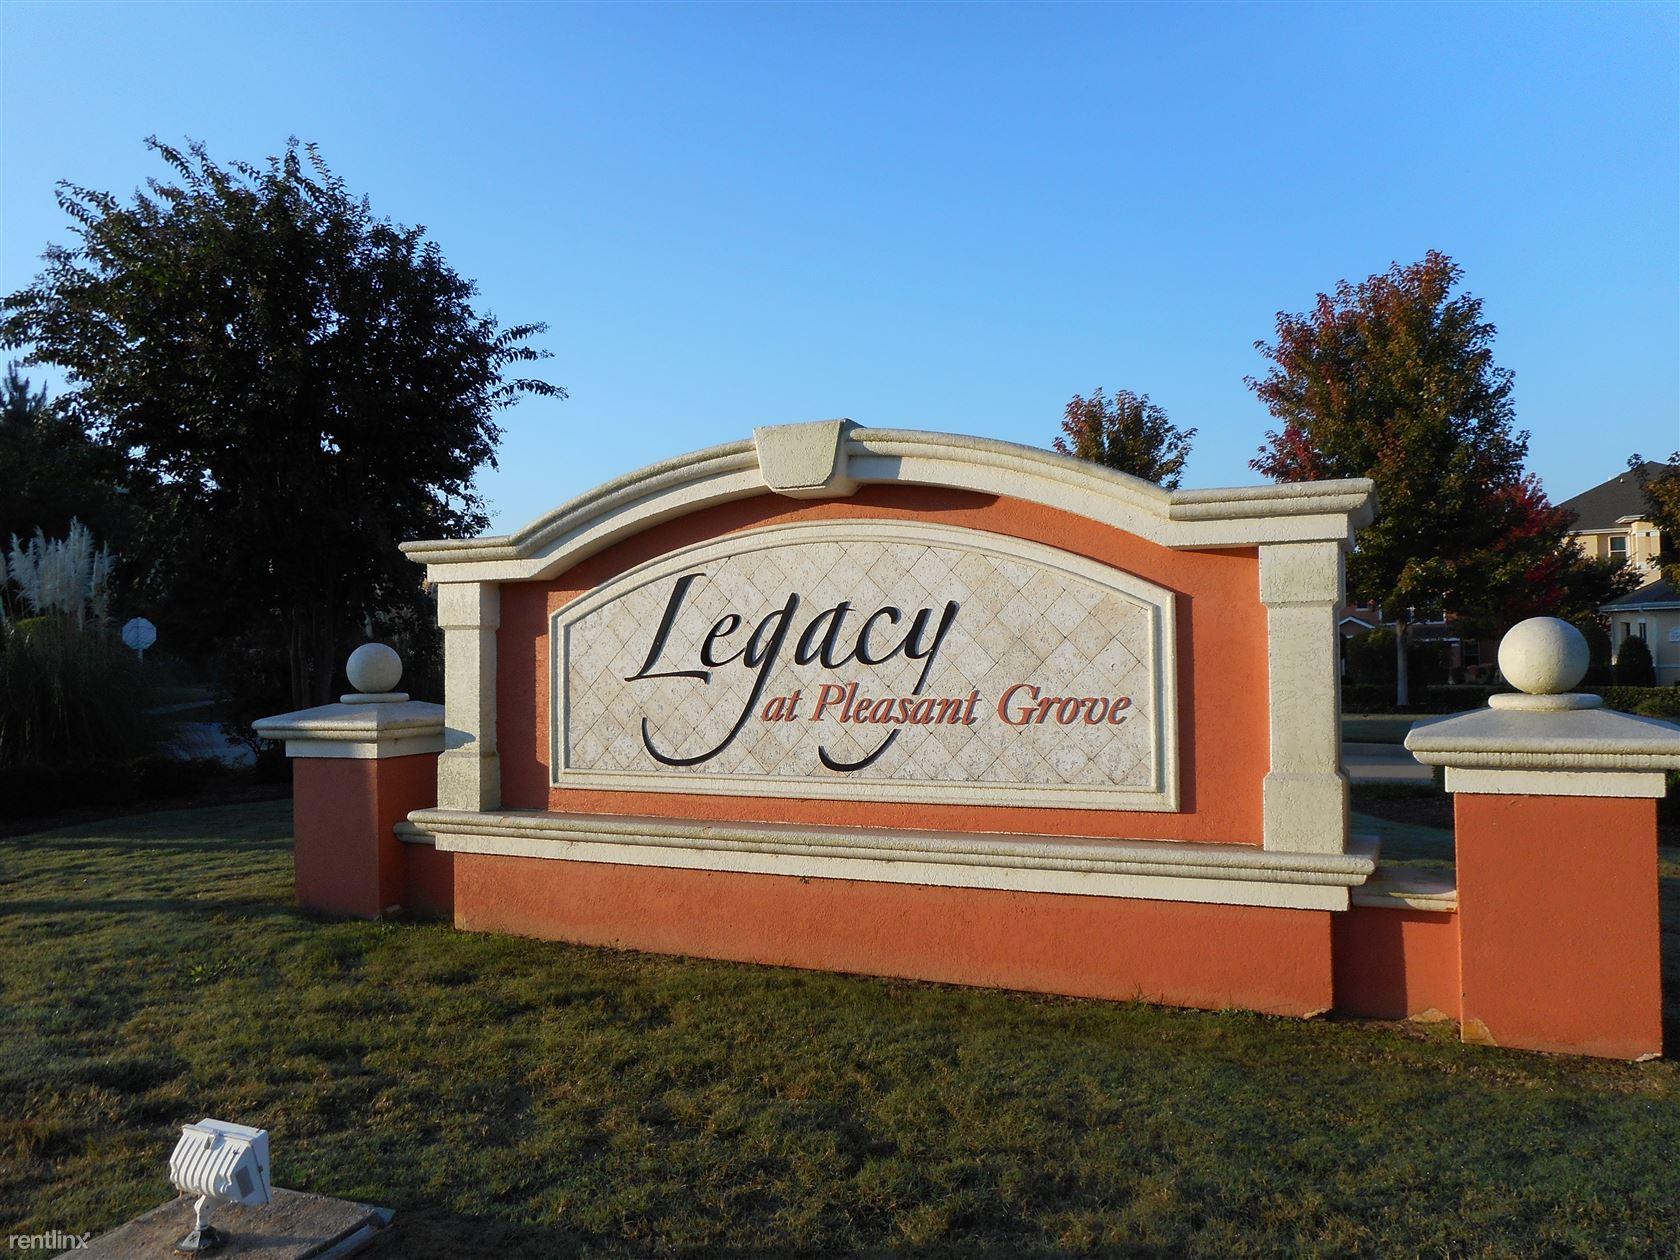 Legacy at Pleasant Grove